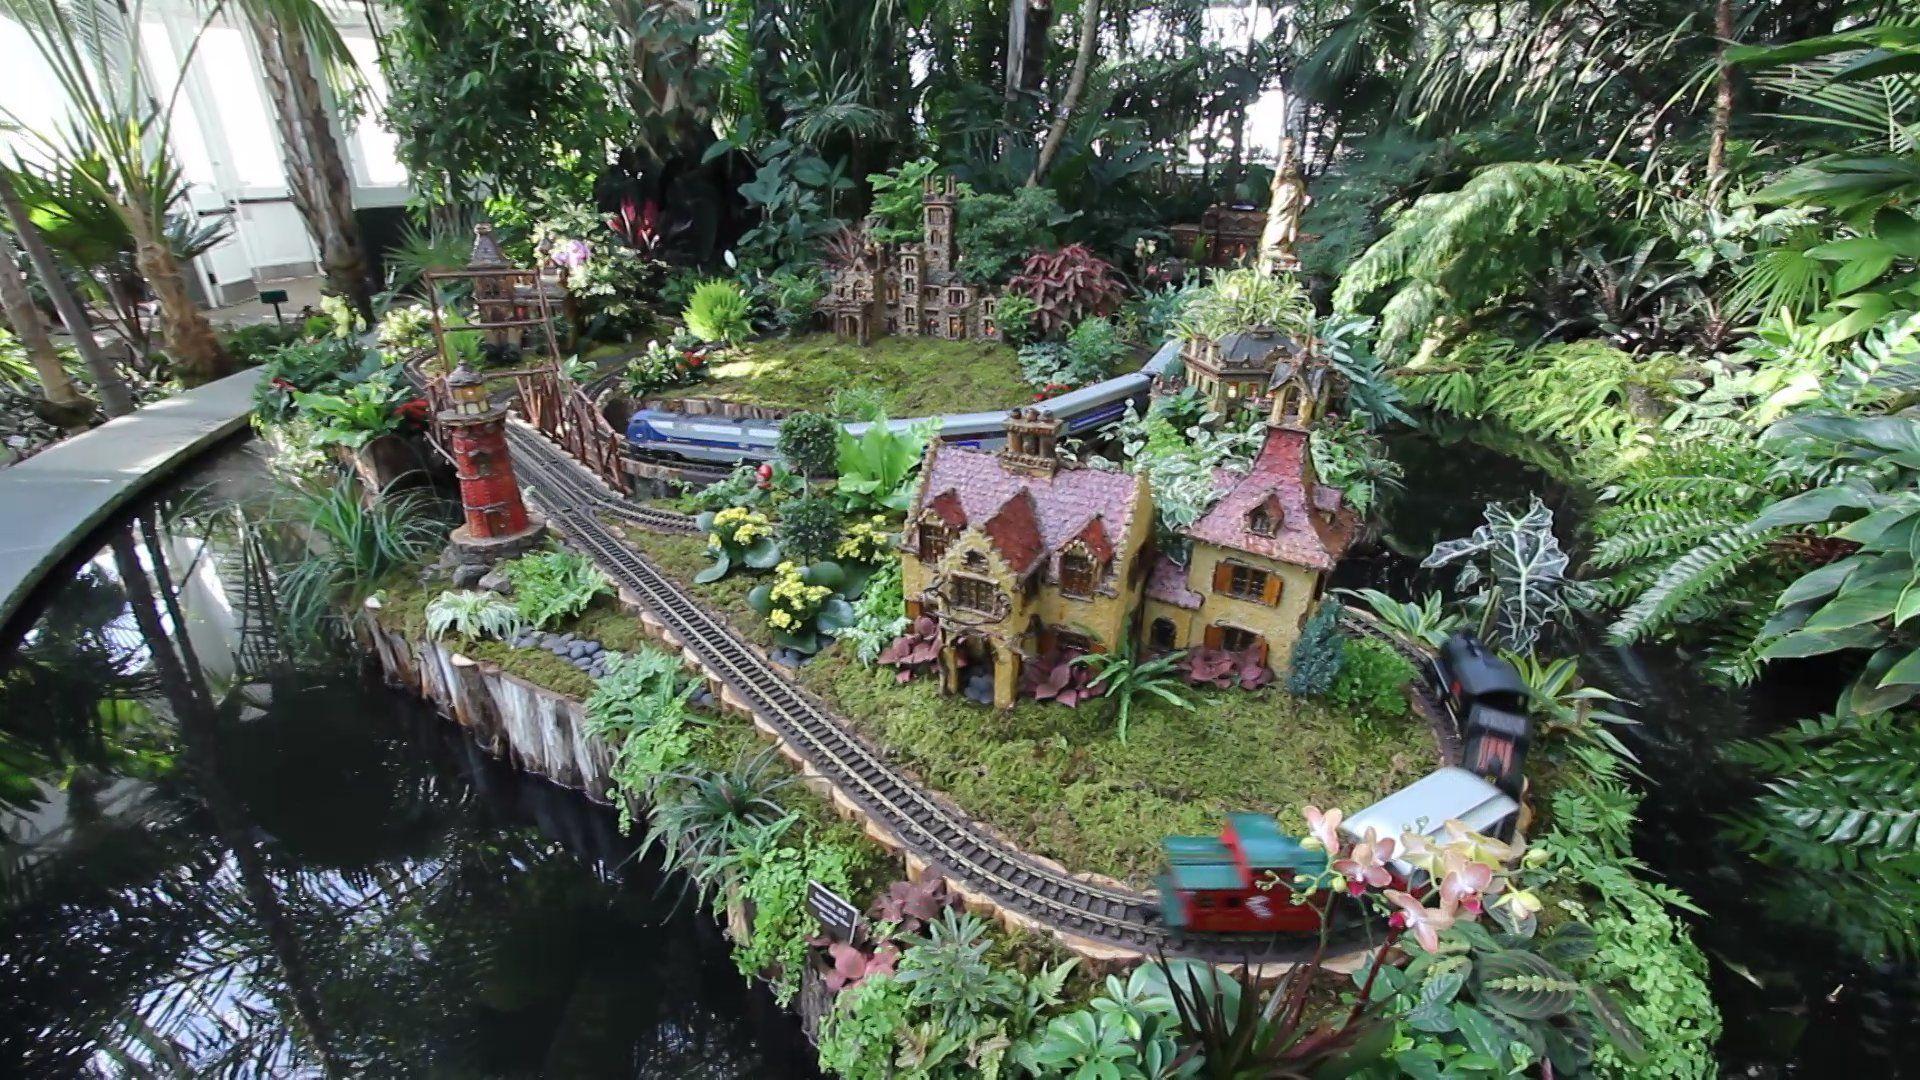 The New York Botanical Garden Holiday Train Show